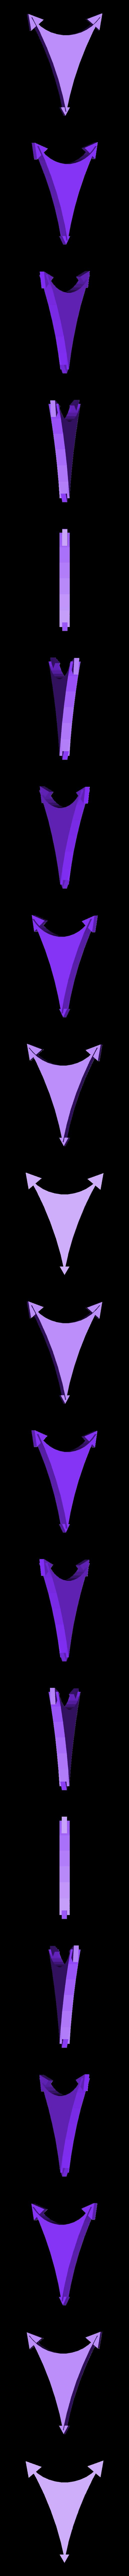 25 DUA-Dent ElasticCentrePiramidal 2'30 04 -oo-.stl Download free STL file DUA-Dent / Smooth ElasticCentreOctogonal/Pyramidal Curve 2'30mm • 3D printing template, carleslluisar